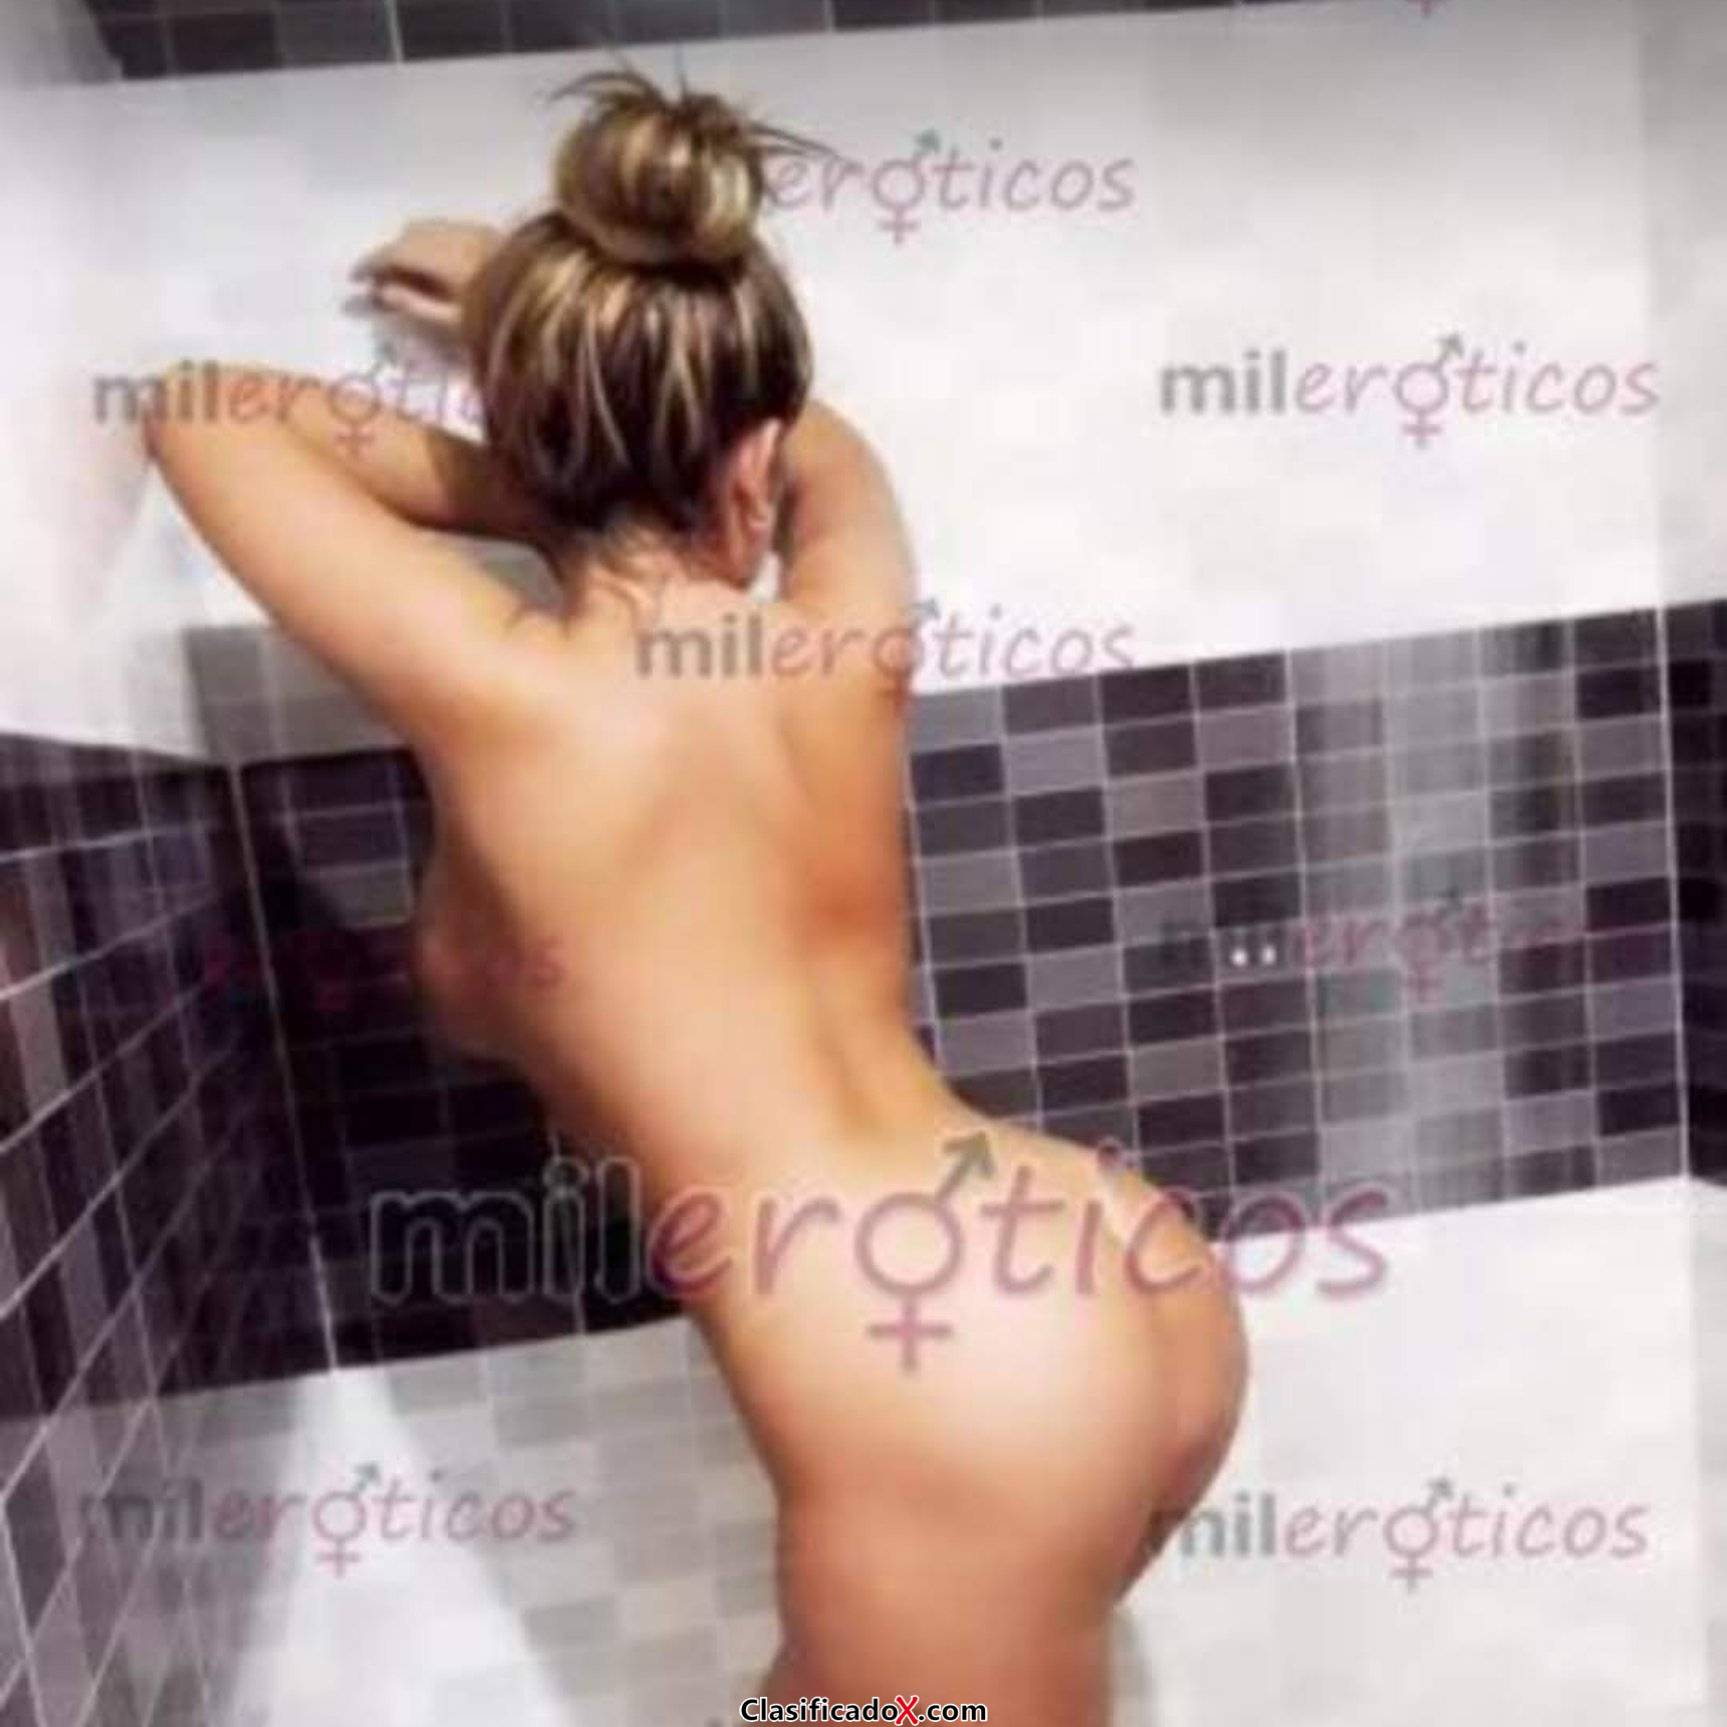 ➡❤➡RUBIA BELLA SENSUL MARIANA GOMEZ 3224298340 $ 150